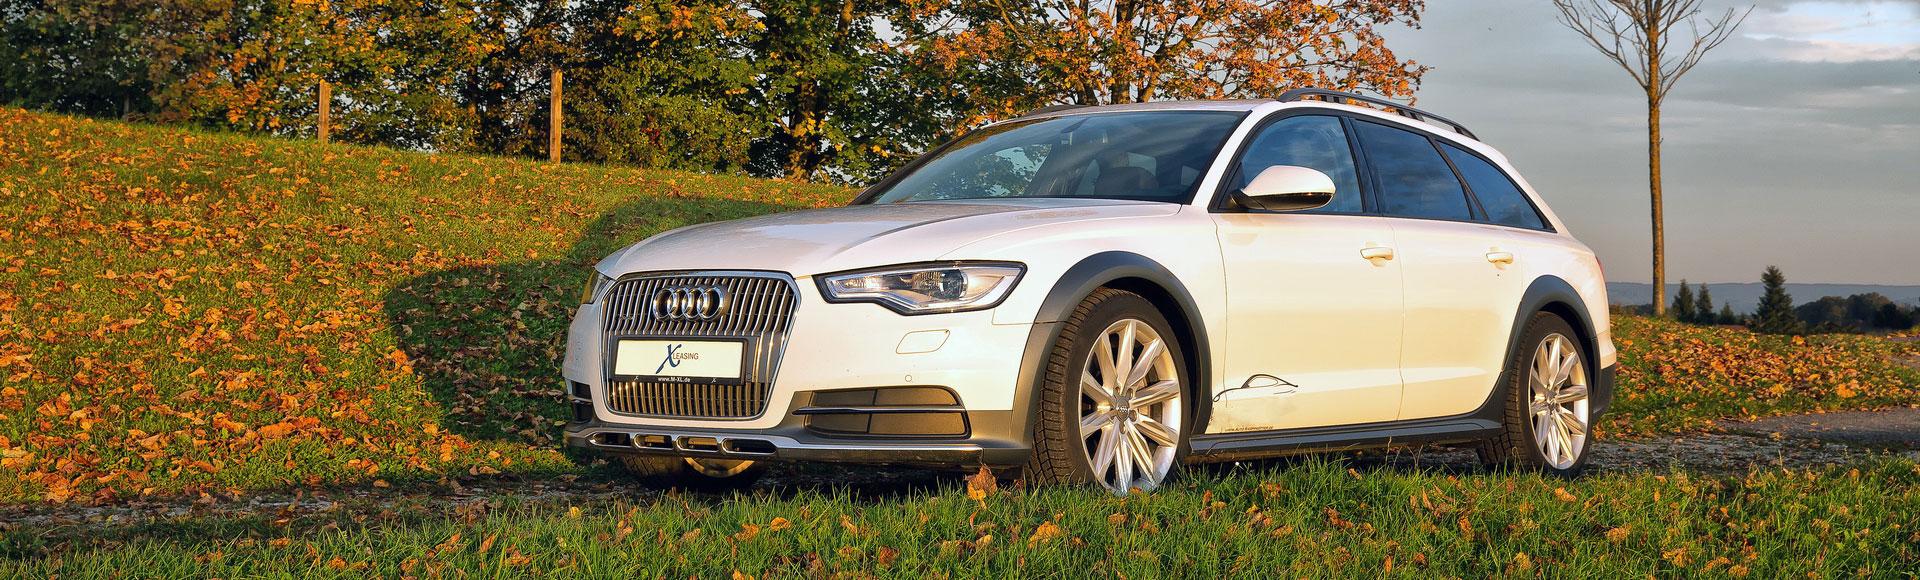 Audi A6 Allroad 2014 Herbst 3739